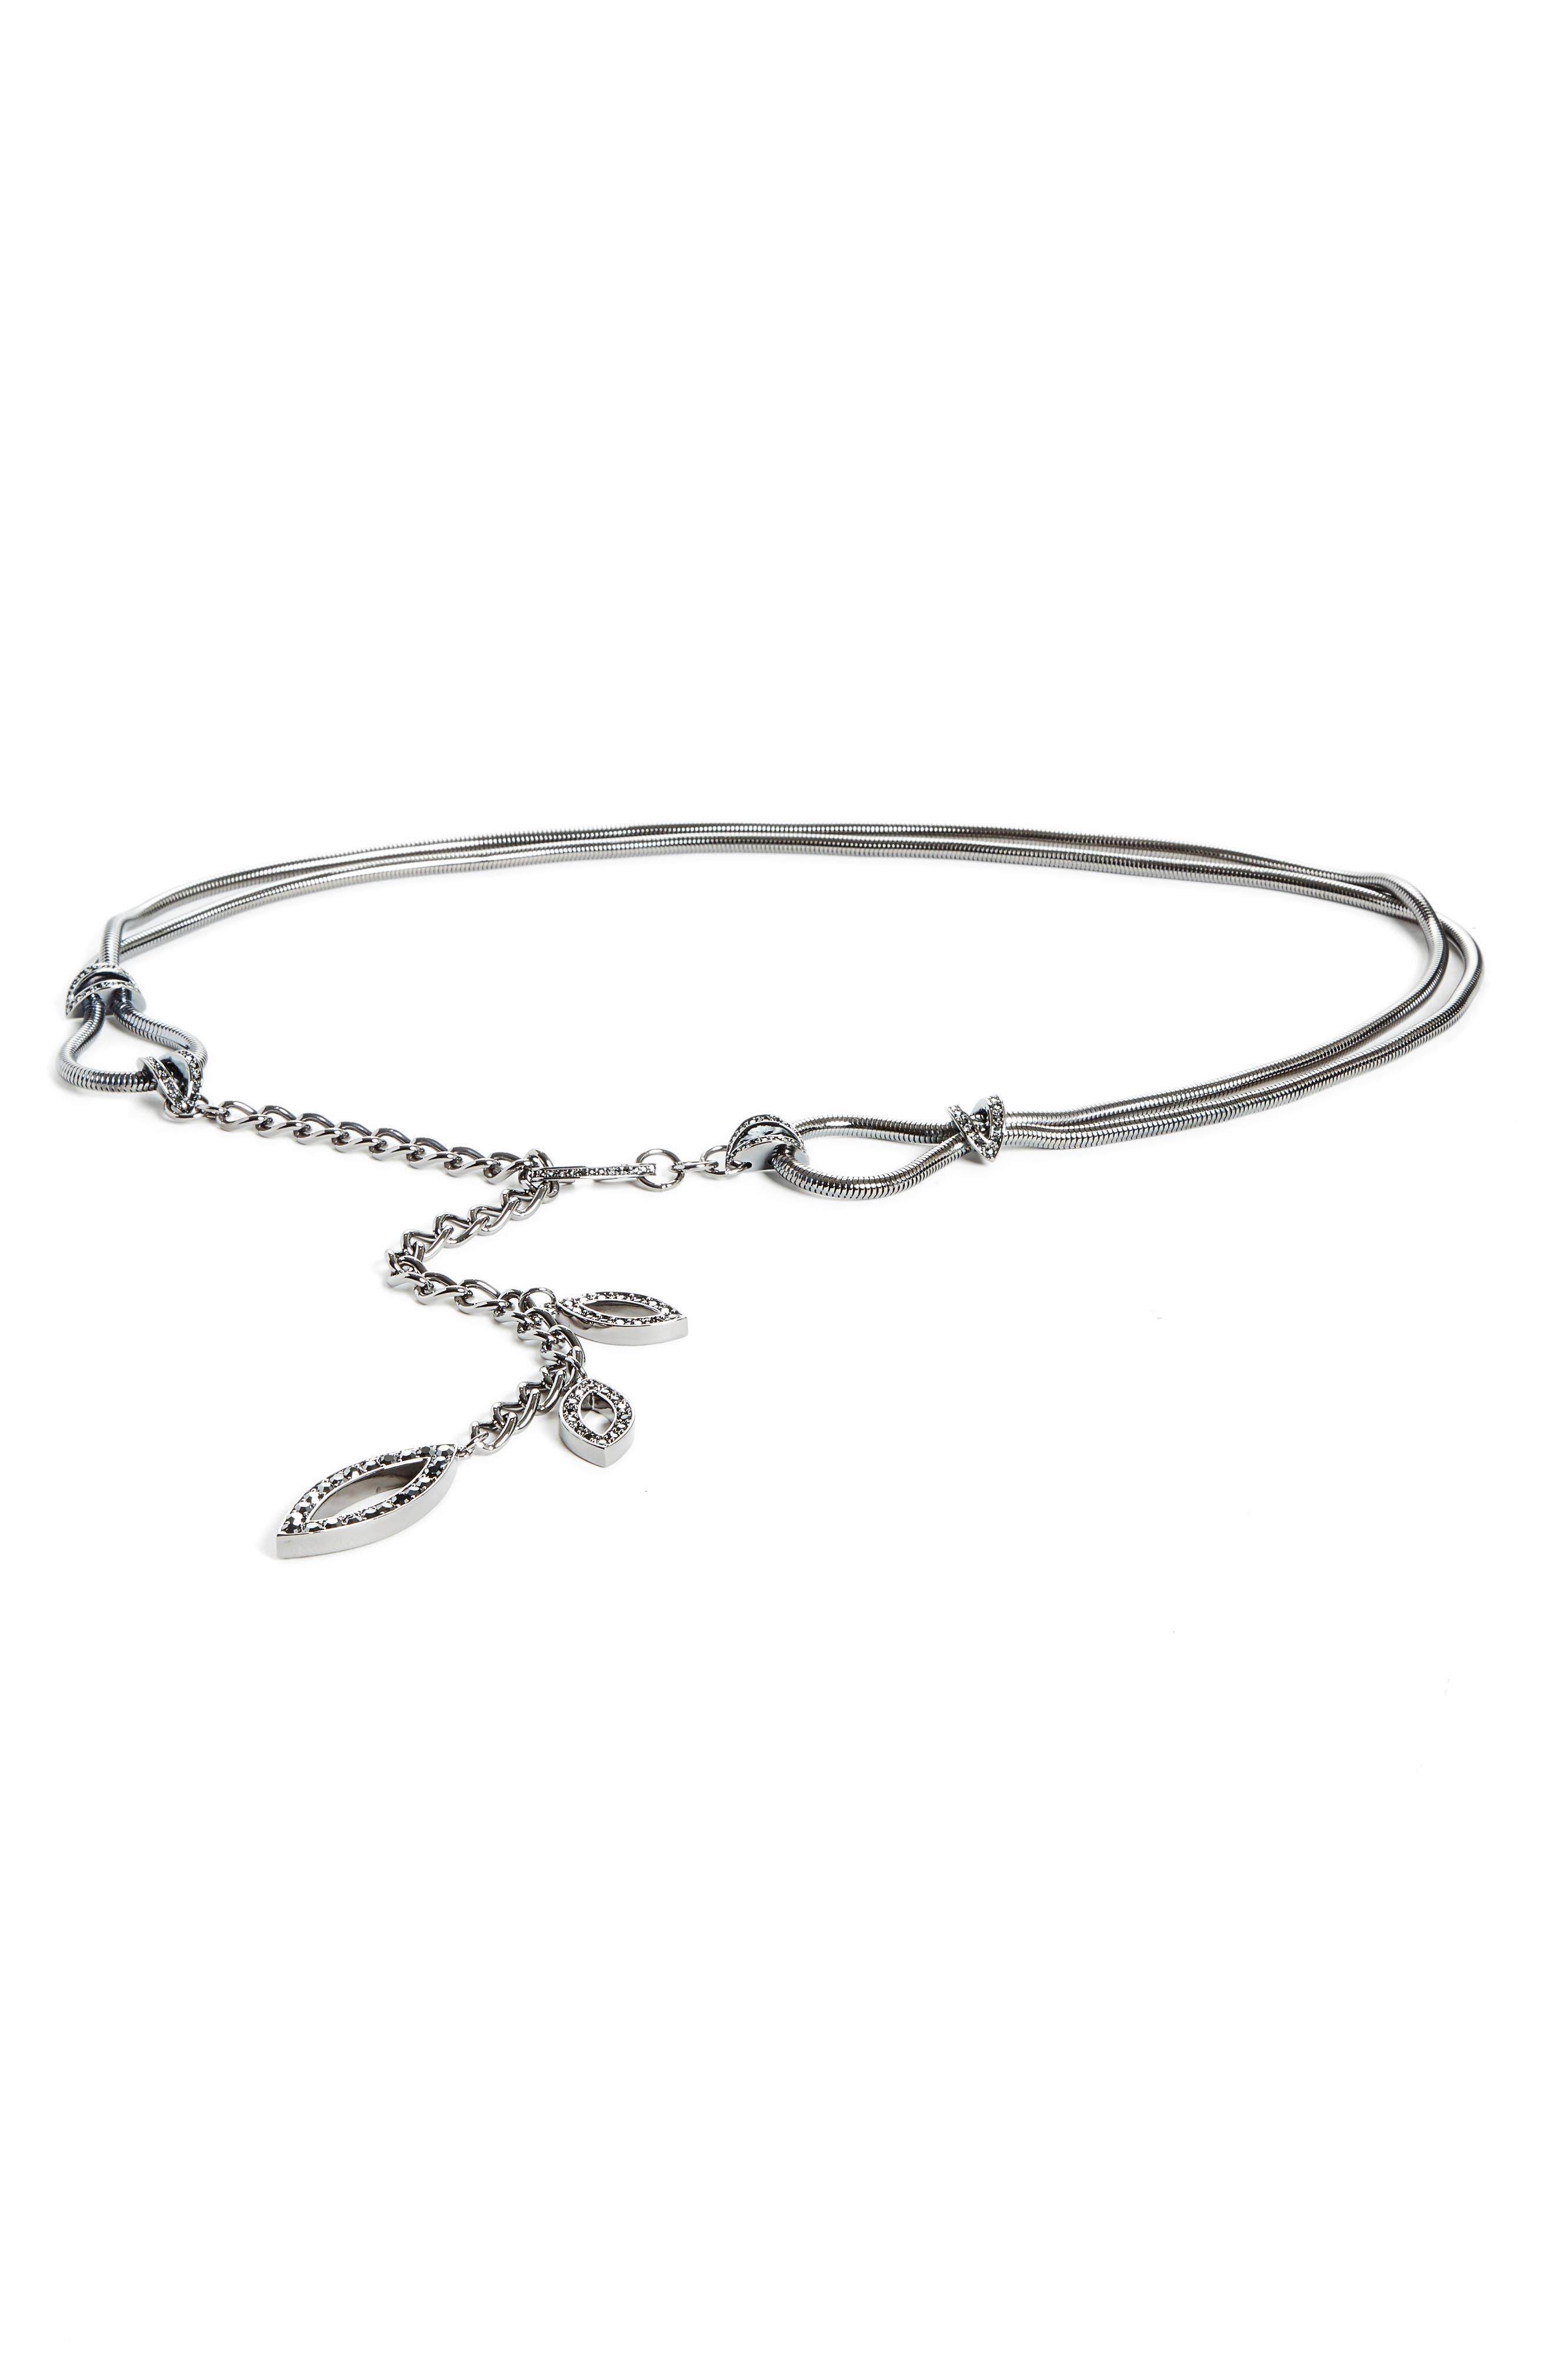 Swarovski Crystal Leaf Chain Belt,                         Main,                         color, Dark Ruth/Css/Jet Hematite